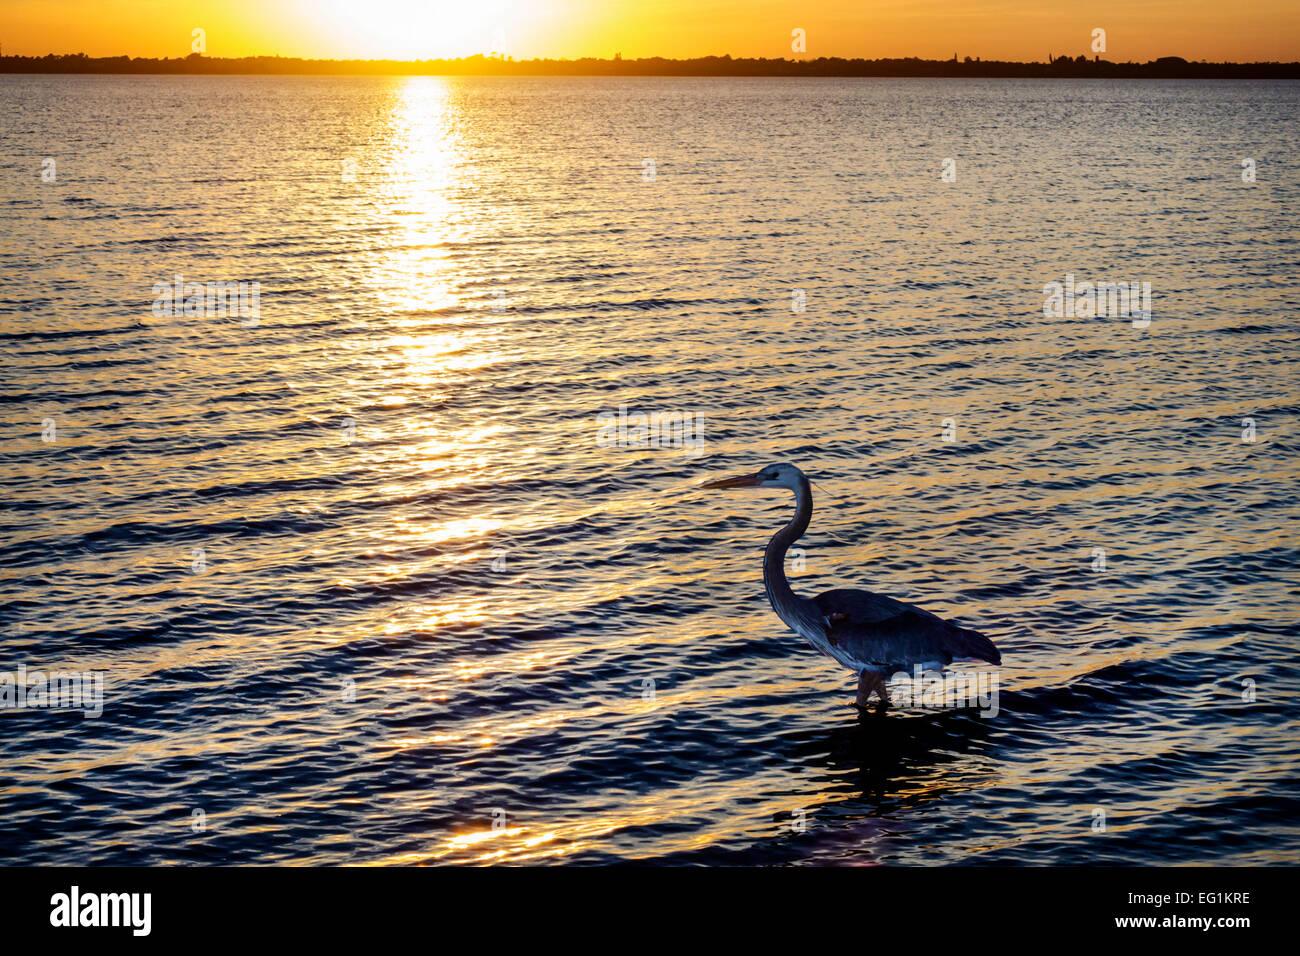 Florida Jensen Beach Indian River Lagune Great Blue Heron waten Wasser silhouette Stockfoto